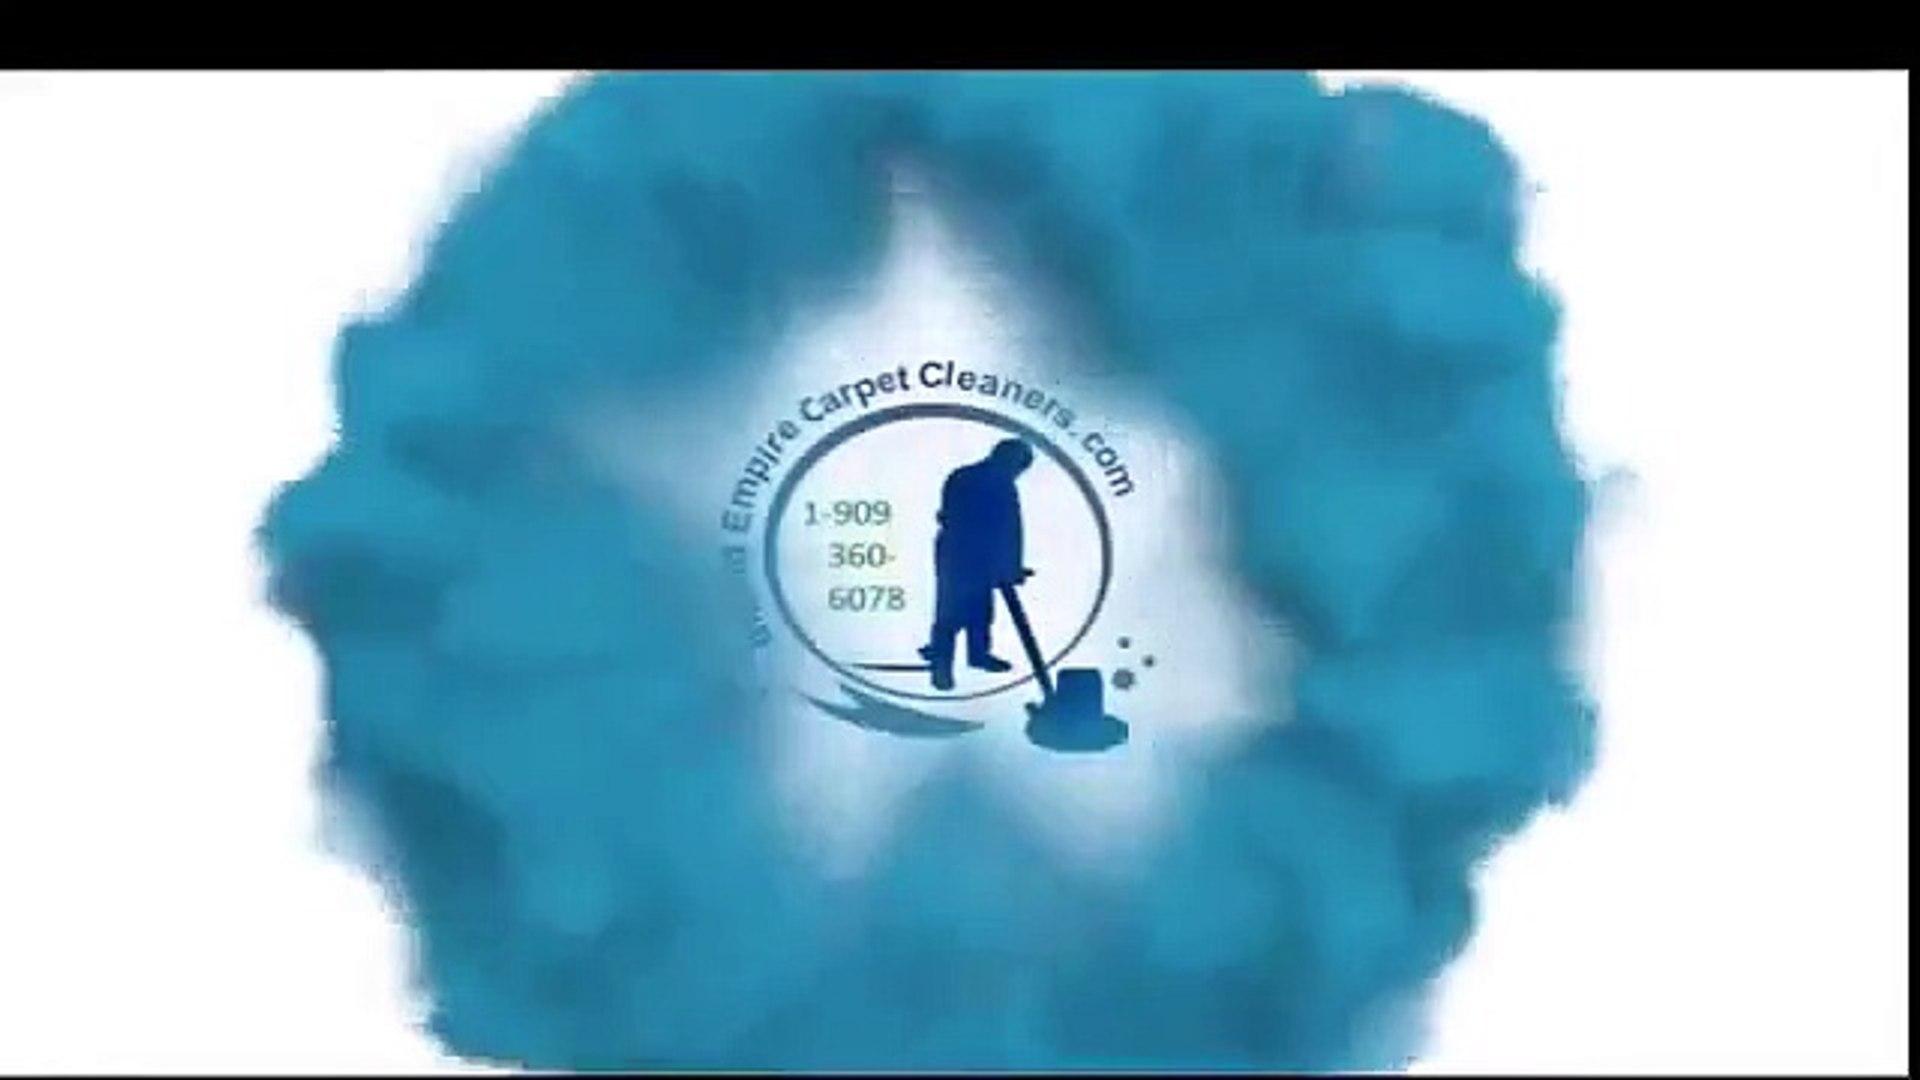 DRY CARPET CLEANING Corona